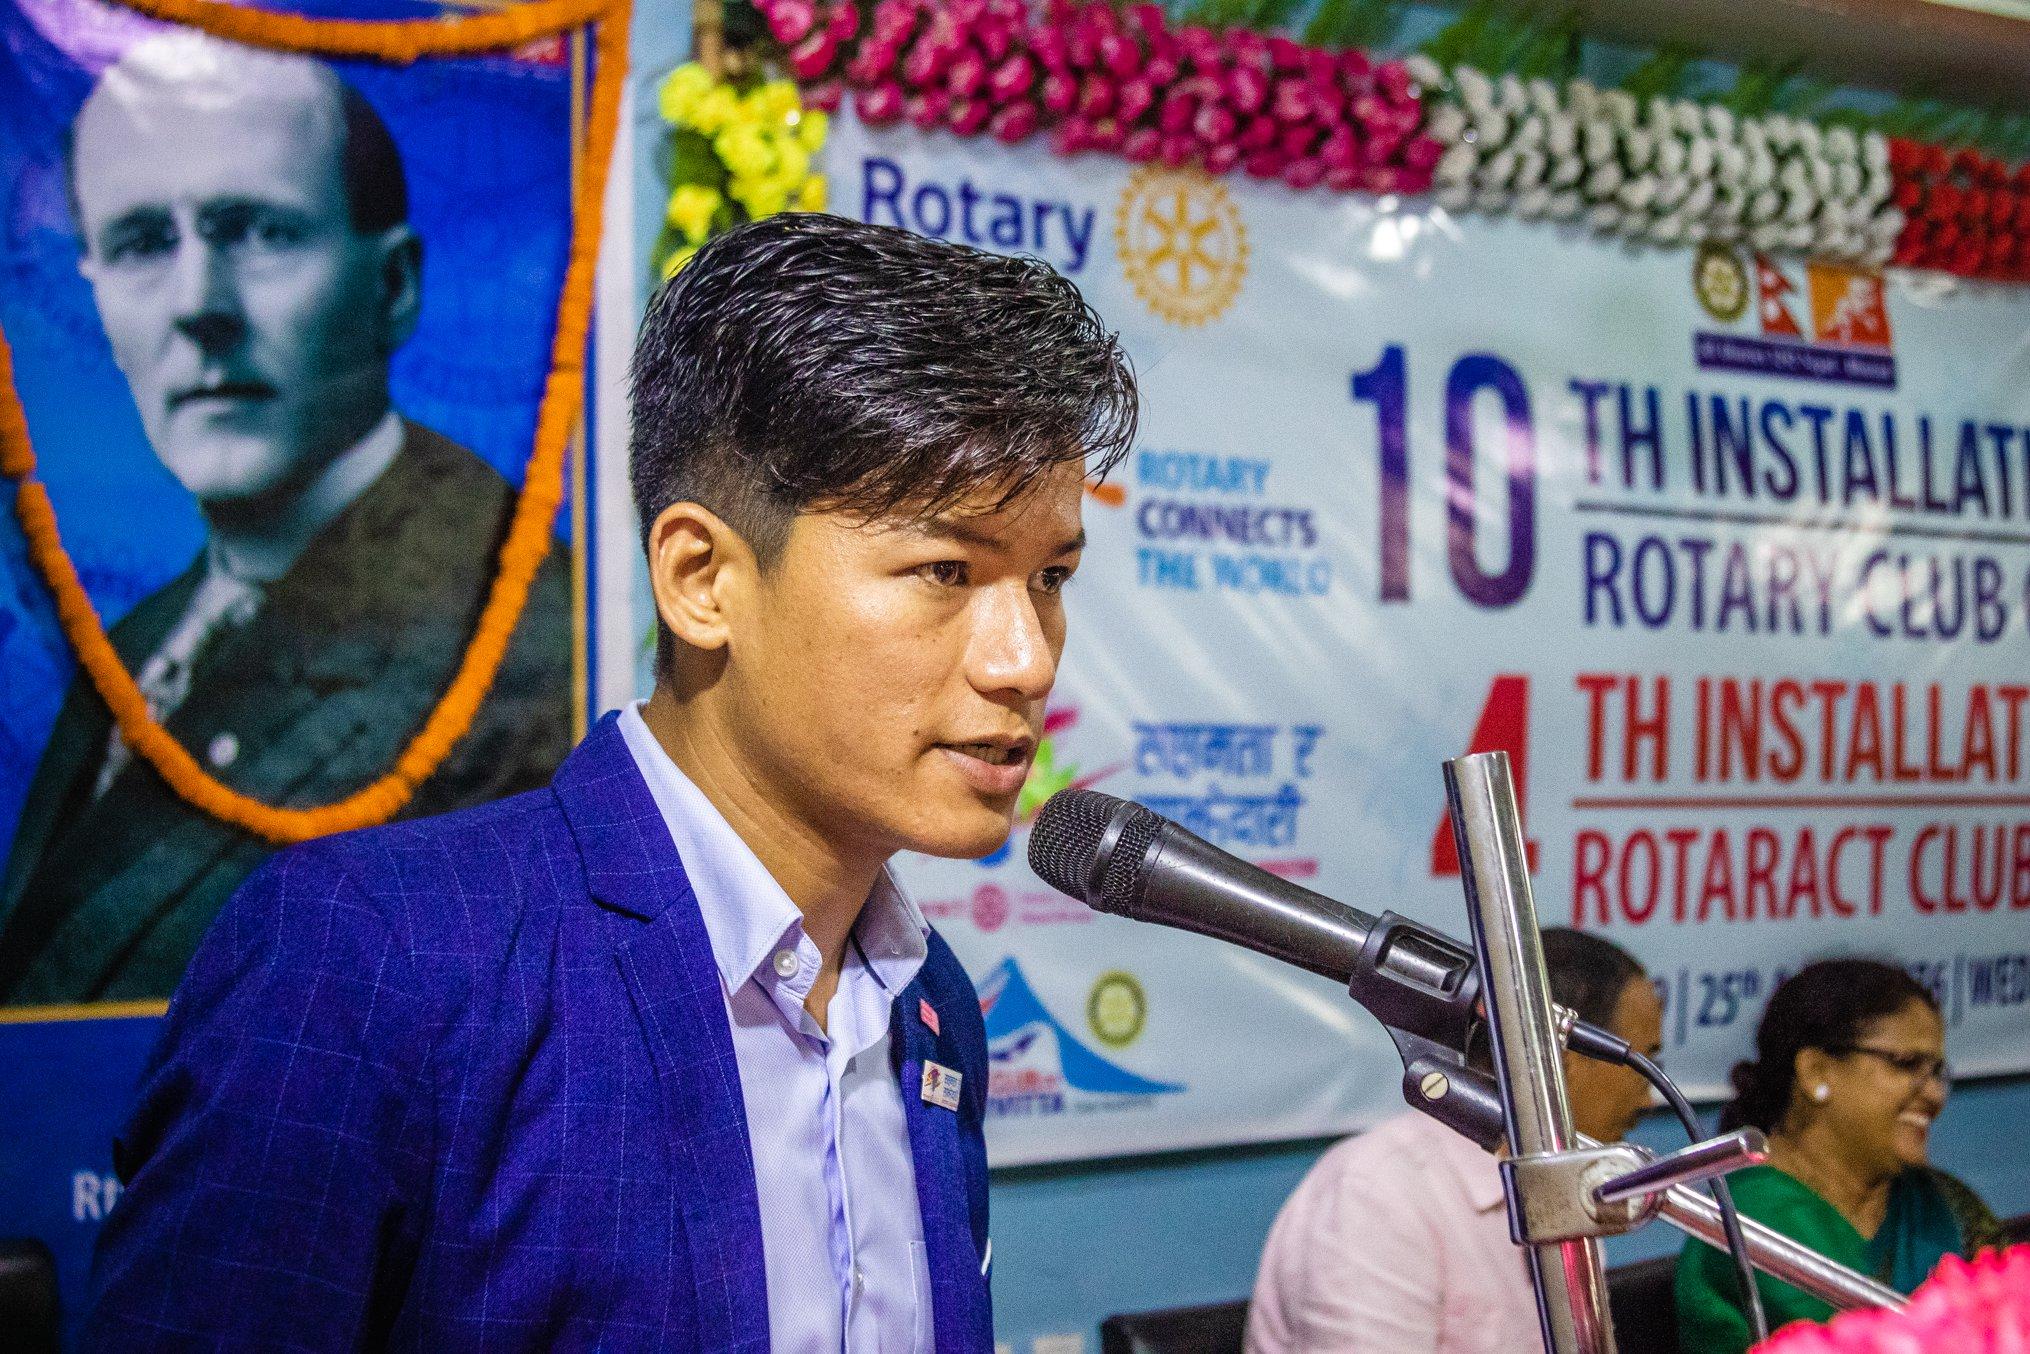 10th Installation Ceremony Rotary Club Of Kakarvitta 33